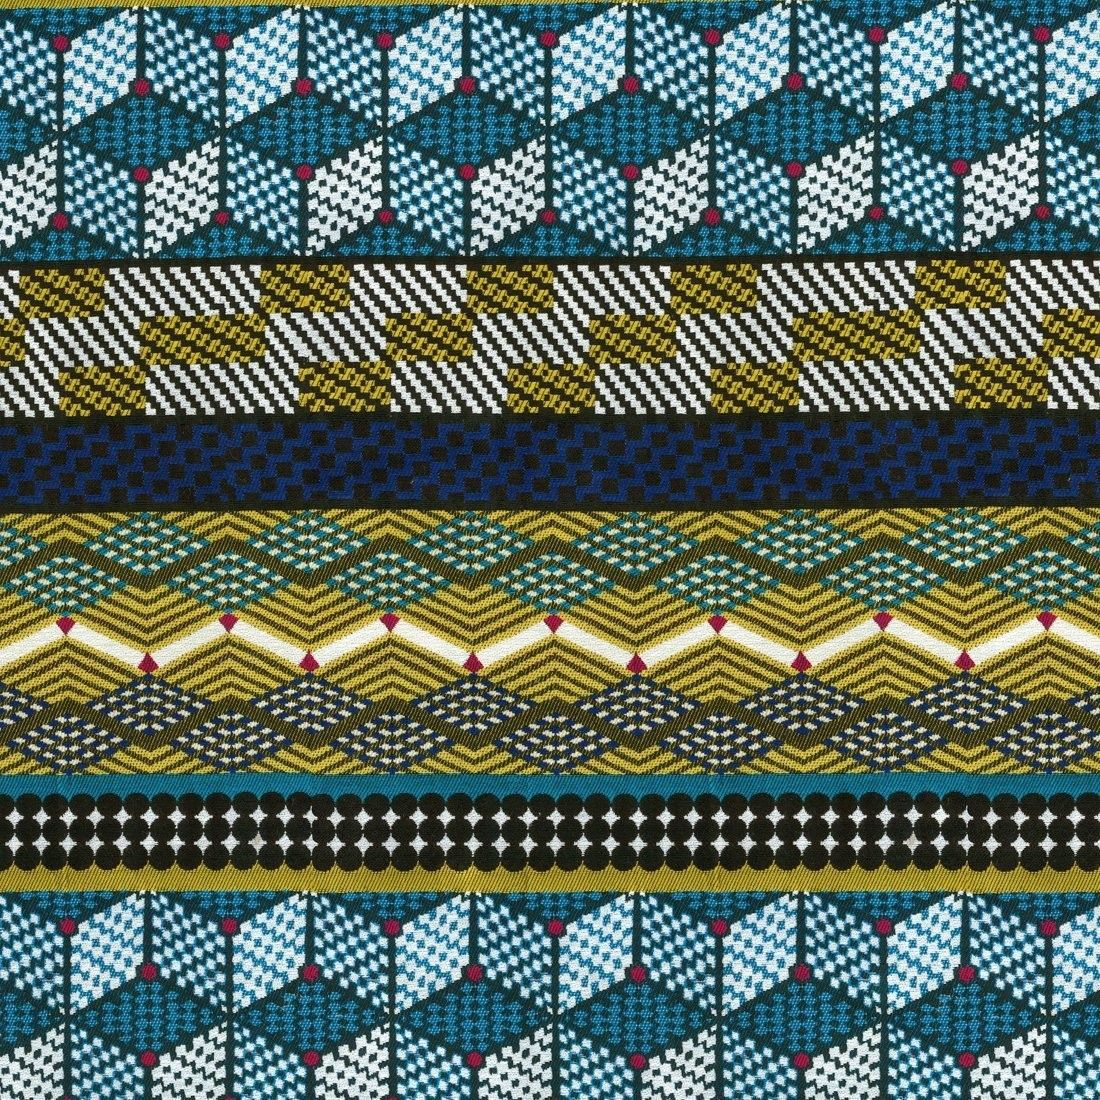 tissu jacquard africain bleu kinshasa mondial tissus couture pinterest tissu jacquard. Black Bedroom Furniture Sets. Home Design Ideas